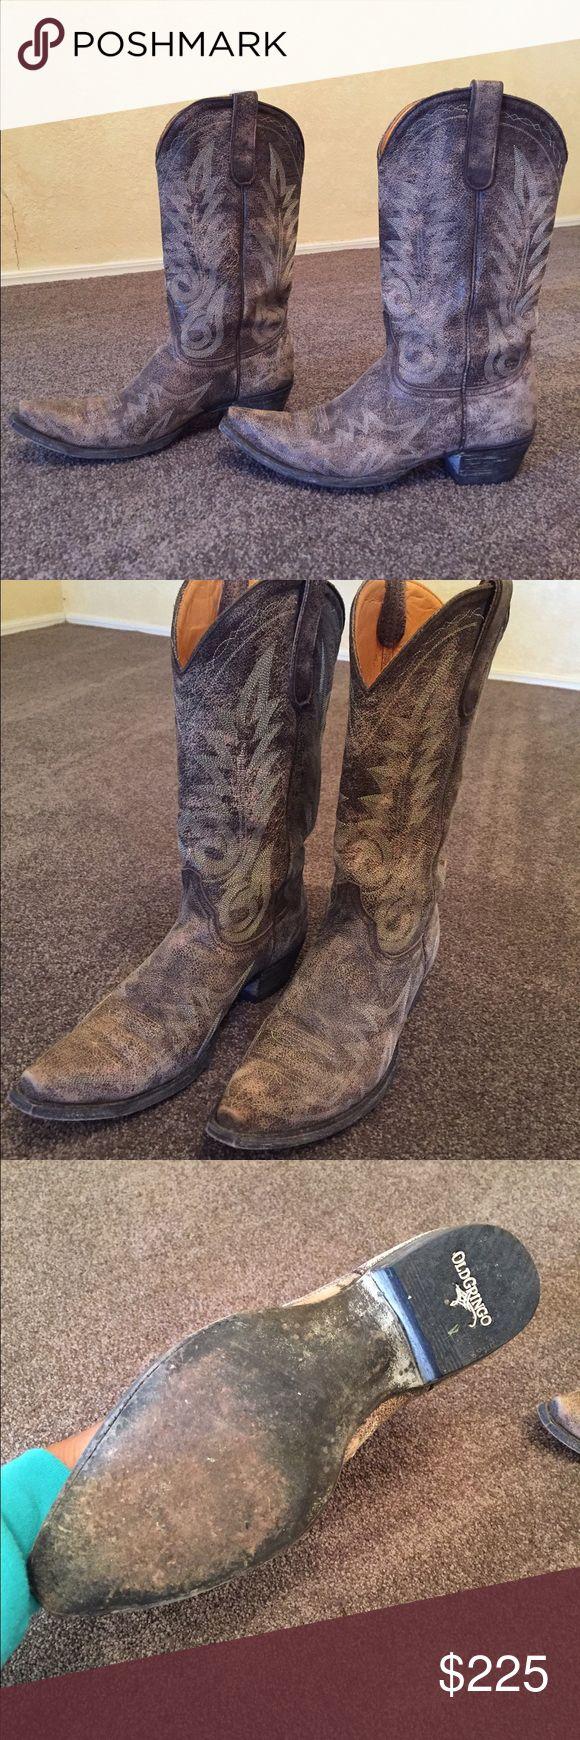 Spotted while shopping on Poshmark: Old Gringo Distressed Nevada Boots! #poshmark #fashion #shopping #style #Old Gringo #Shoes